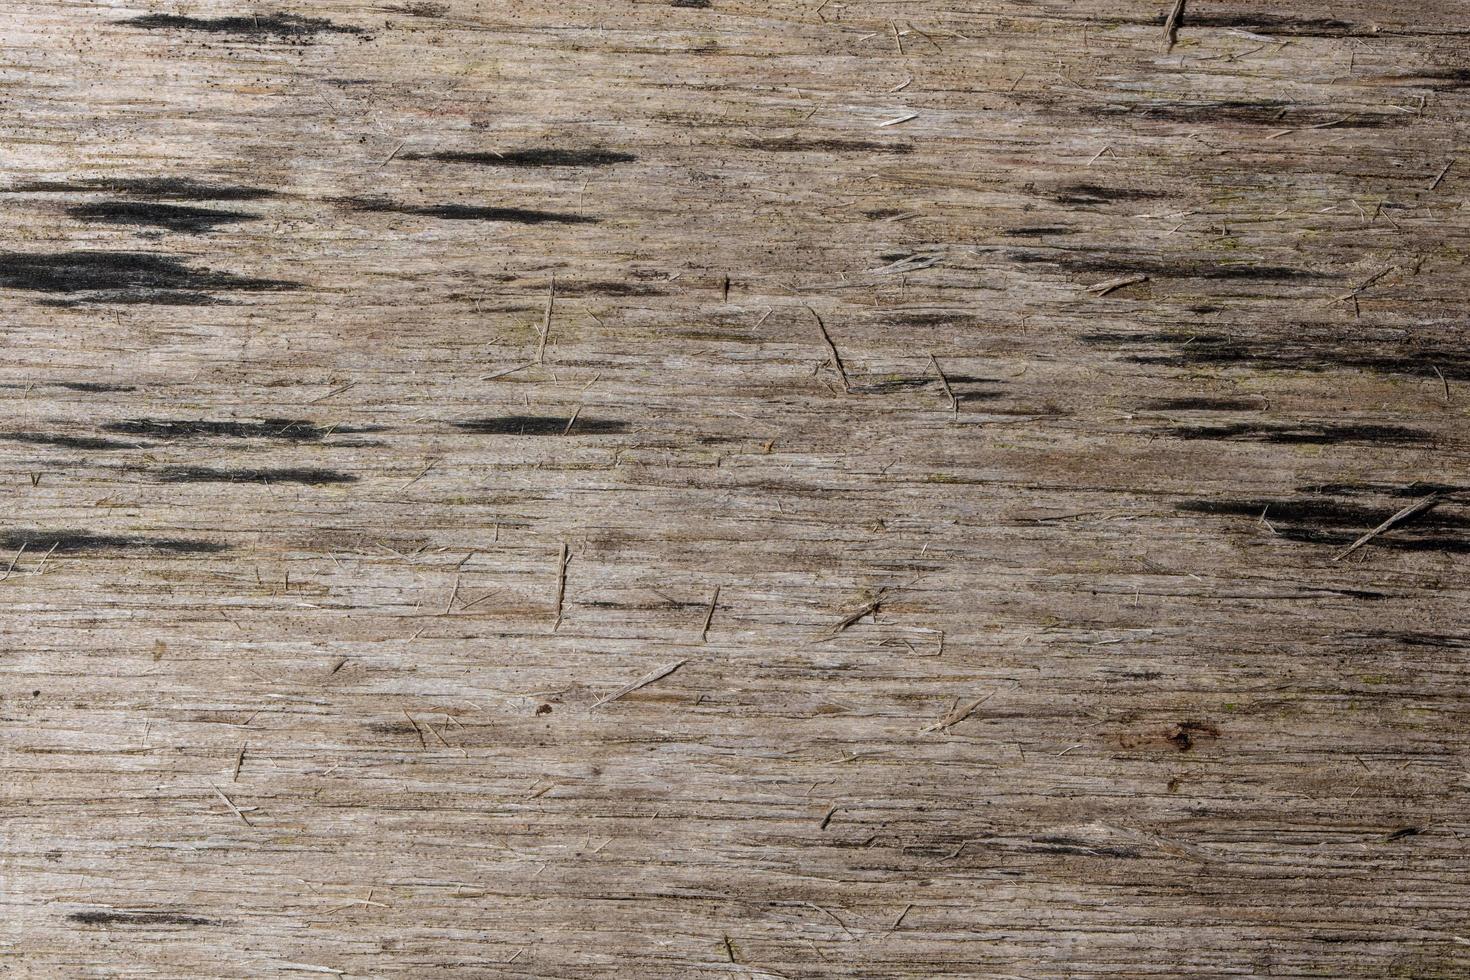 achtergrond houtstructuur foto